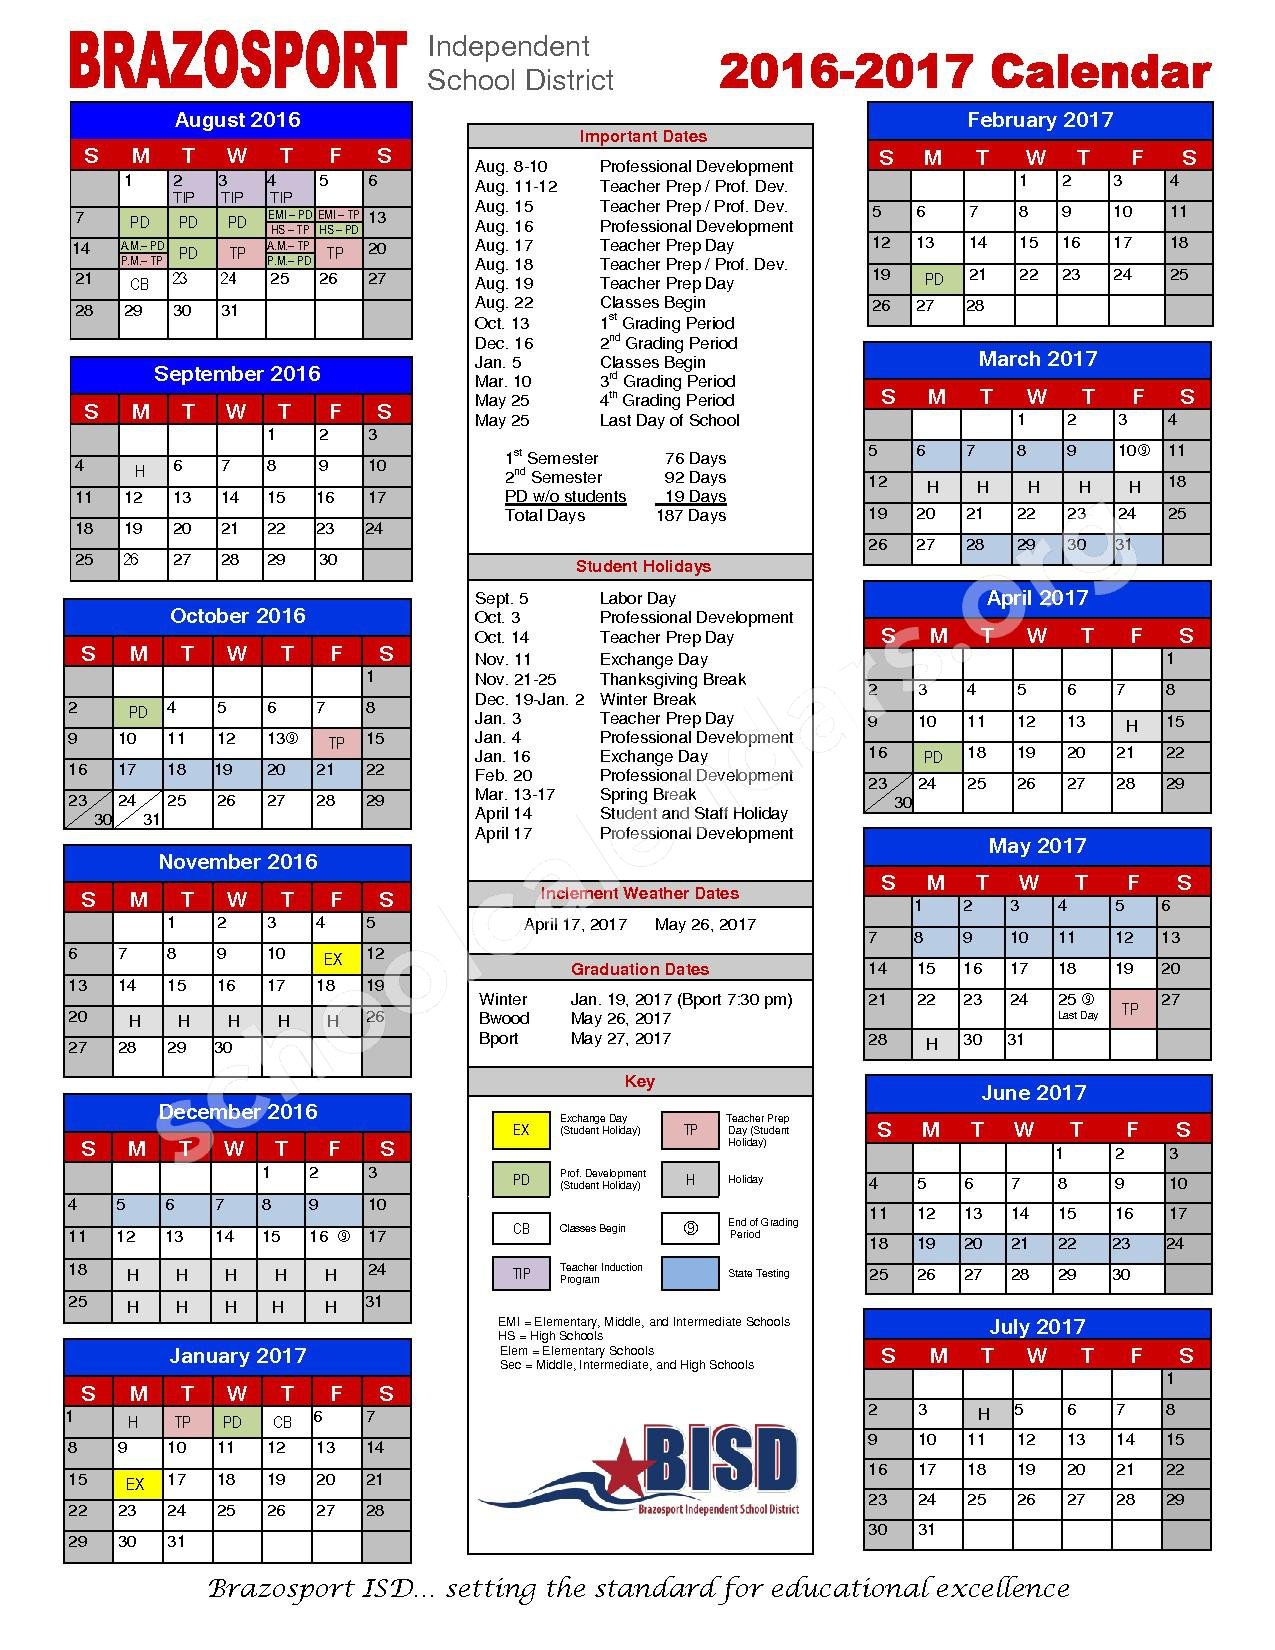 2016 - 2017 School Calendar – Brazosport Independent School District – page 1